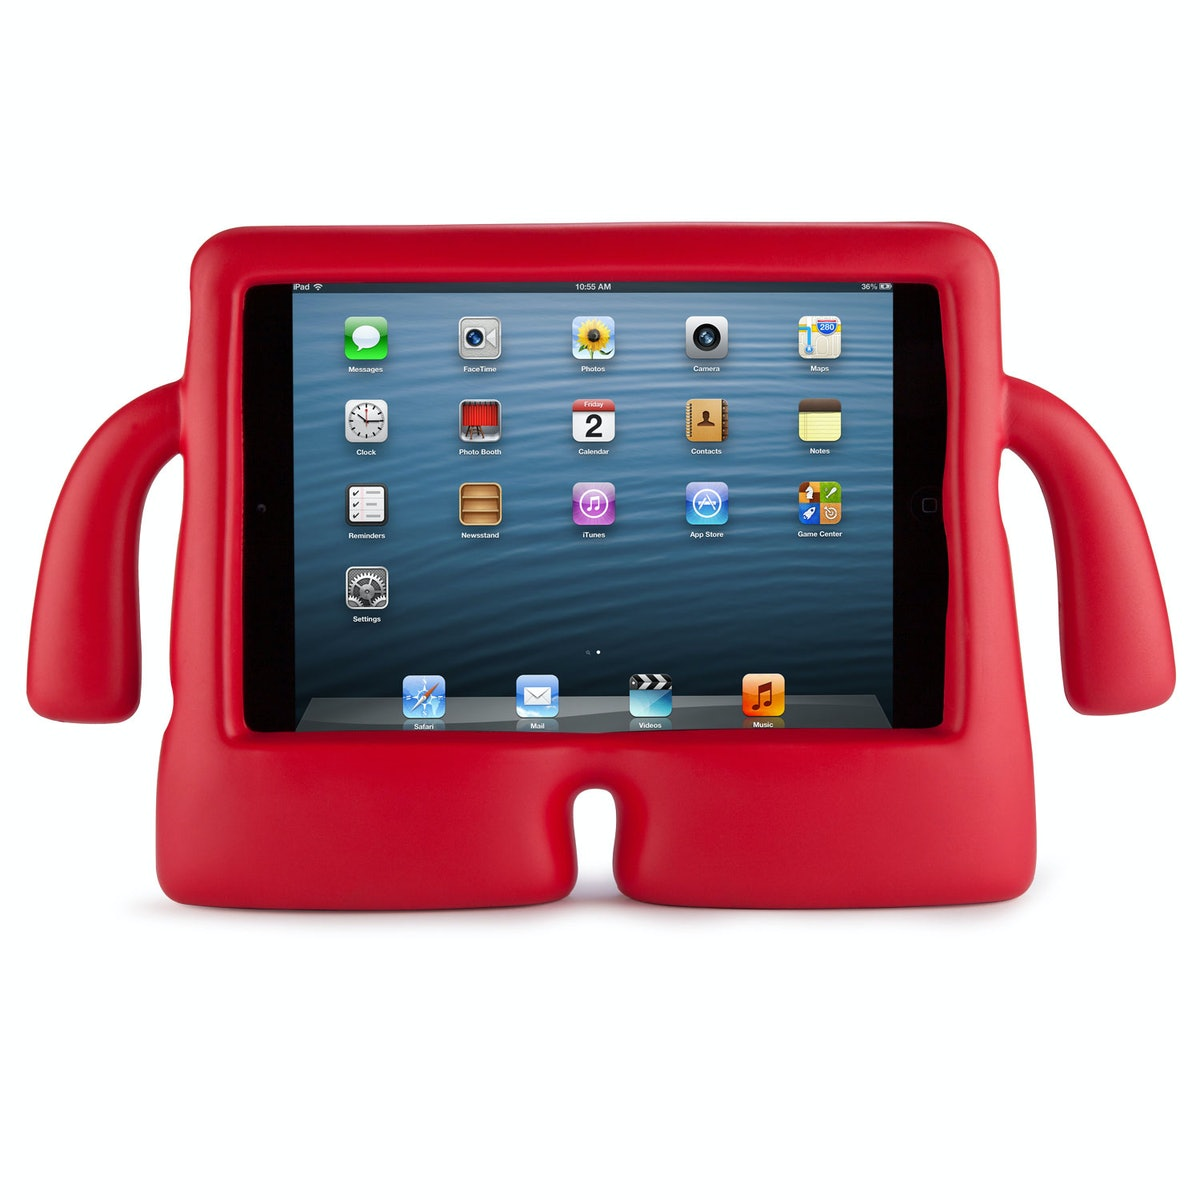 Speck iGuy iPad mini case, $30, [bestbuy.com](http://www.bestbuy.com/site/speck-iguy-case-for-apple-ipad-ipad-2-ipad-3rd-generation-and-ipad-with-retina-red/8526165.p?id=1219050994616&skuId=8526165&ref=06&loc=01&ci_src=14110944&ci_sku=8526165&extensionType={adtype}:{network}&s_kwcid=PTC!pla!{keyword}!{matchtype}!{adwords_producttargetid}!{network}!{ifmobile:M}!{creative}&kpid=8526165&k_clickid=0f52ab71-9cea-c148-32d5-00005b1547a2); Apple iPad mini, starting at $329, [apple.com](www.apple.com).